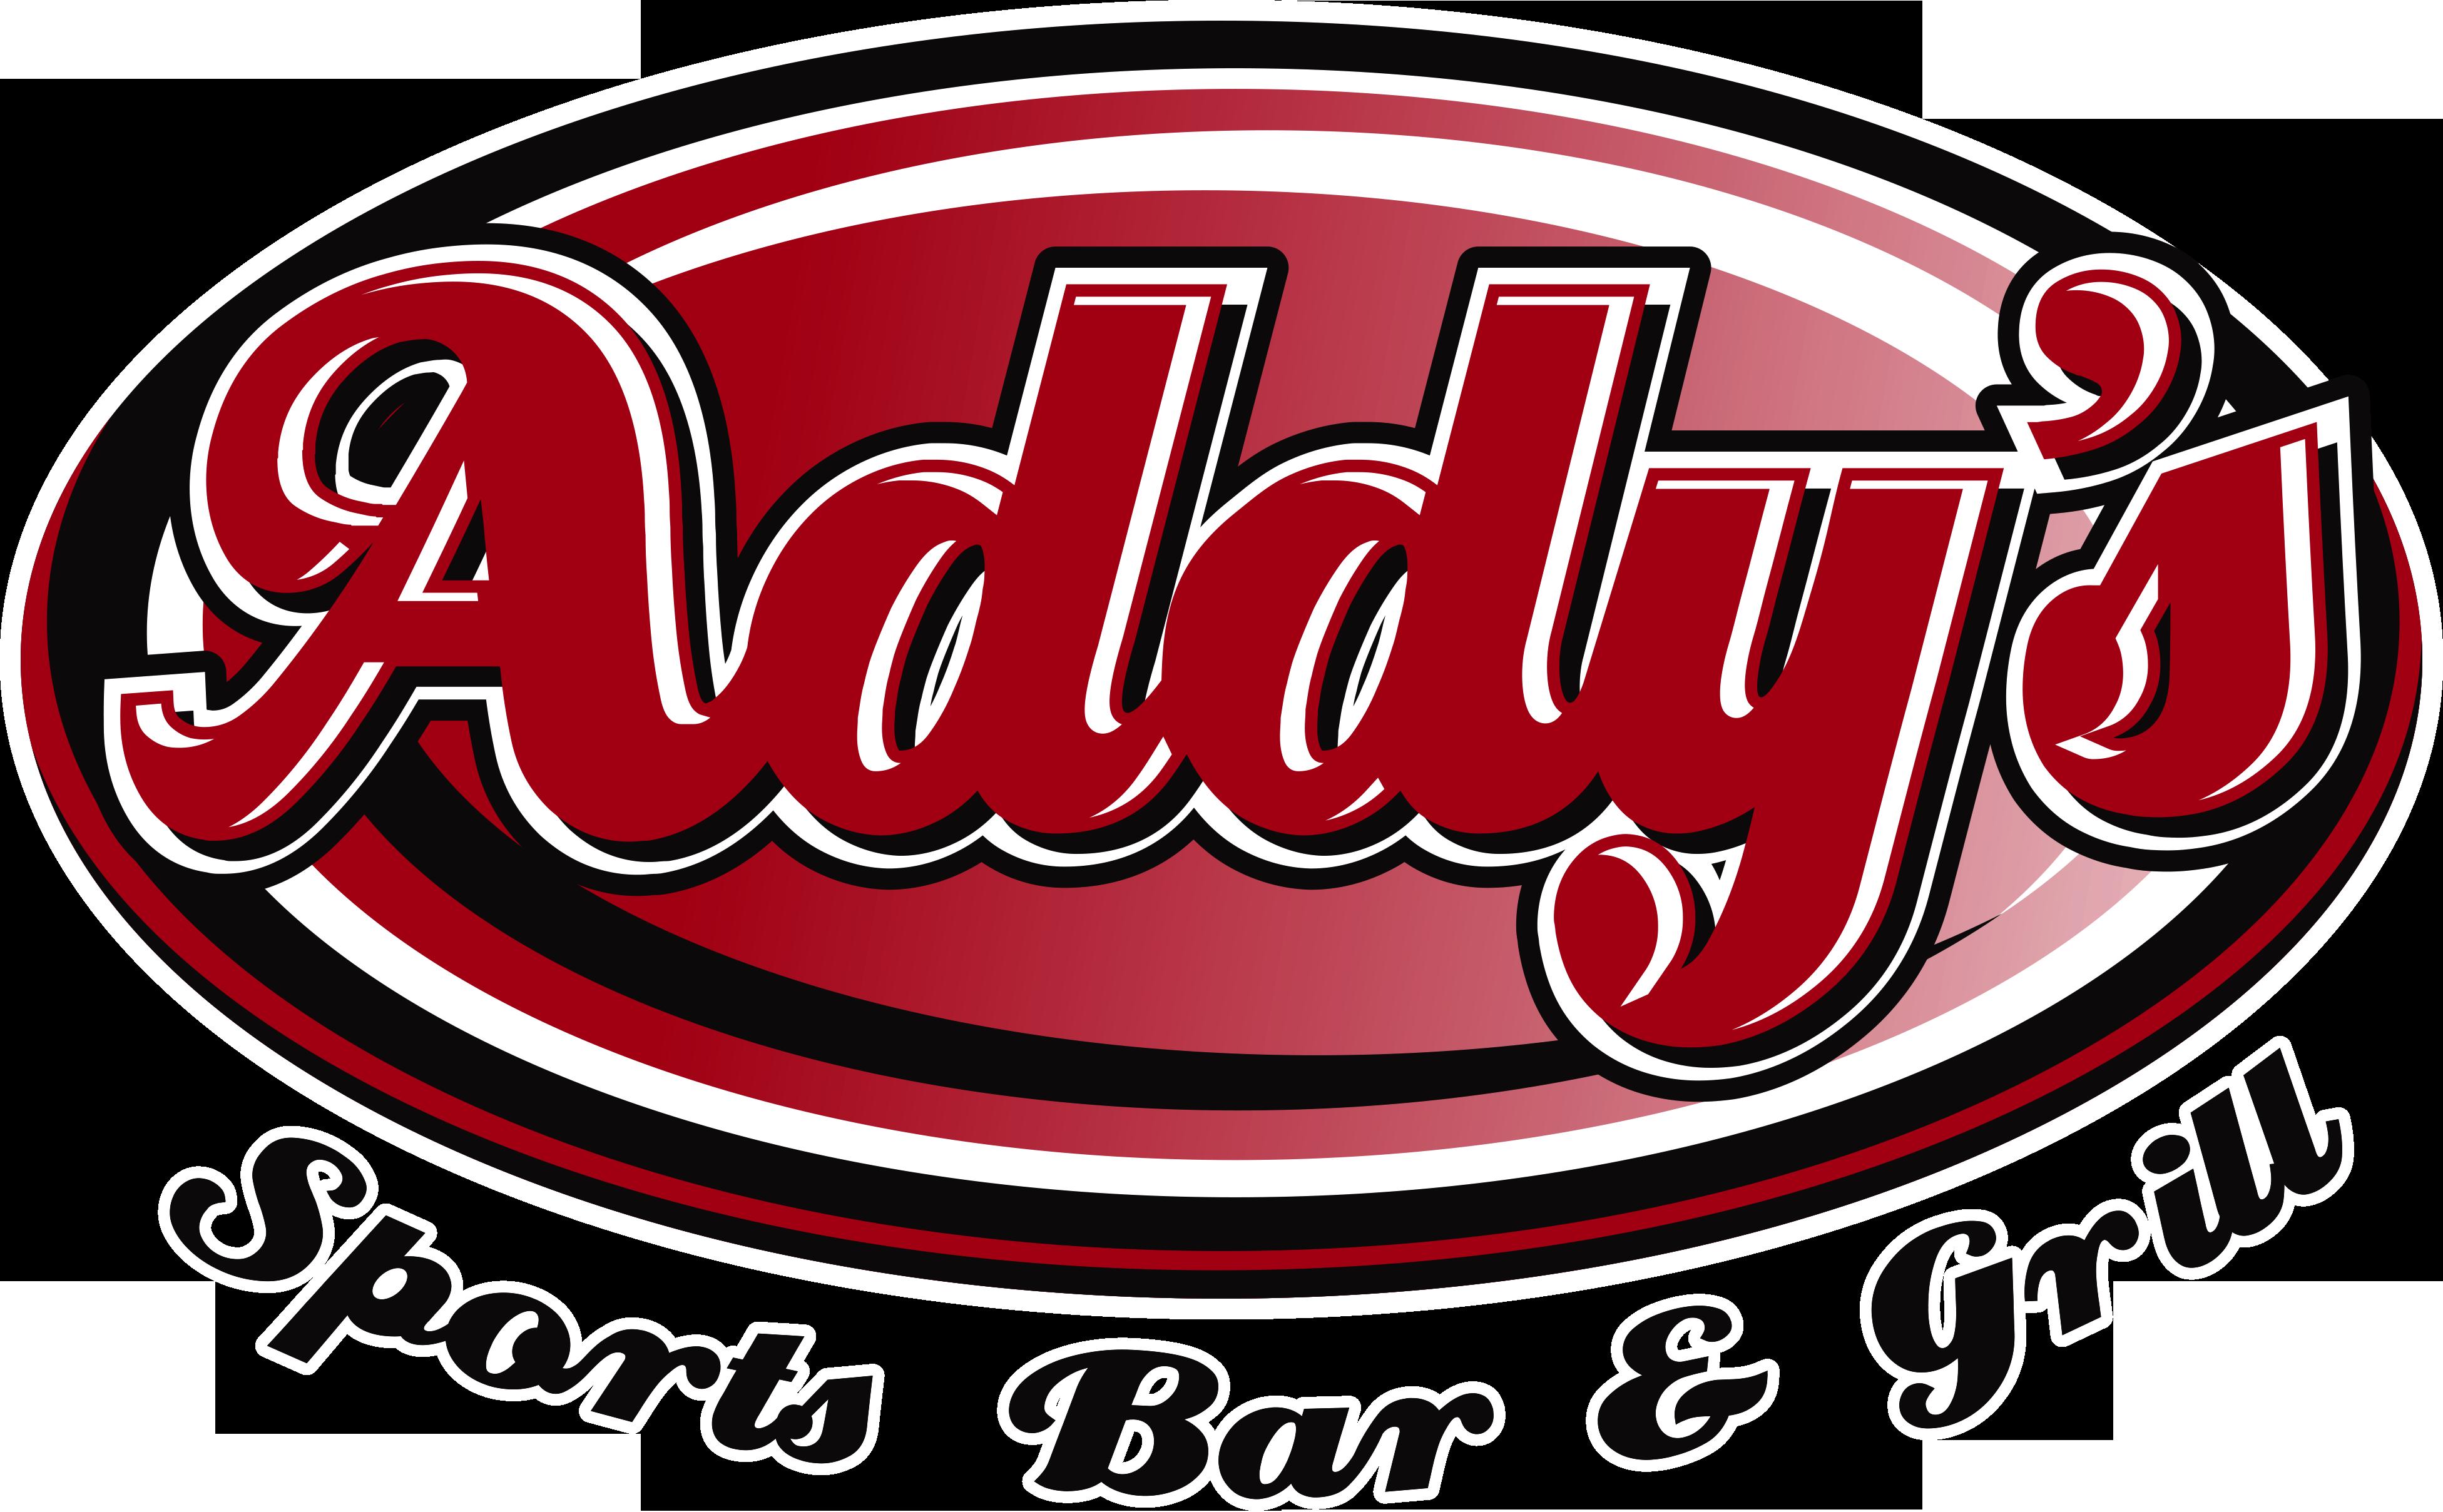 Addy's 10th Annual Golf Tournament logo